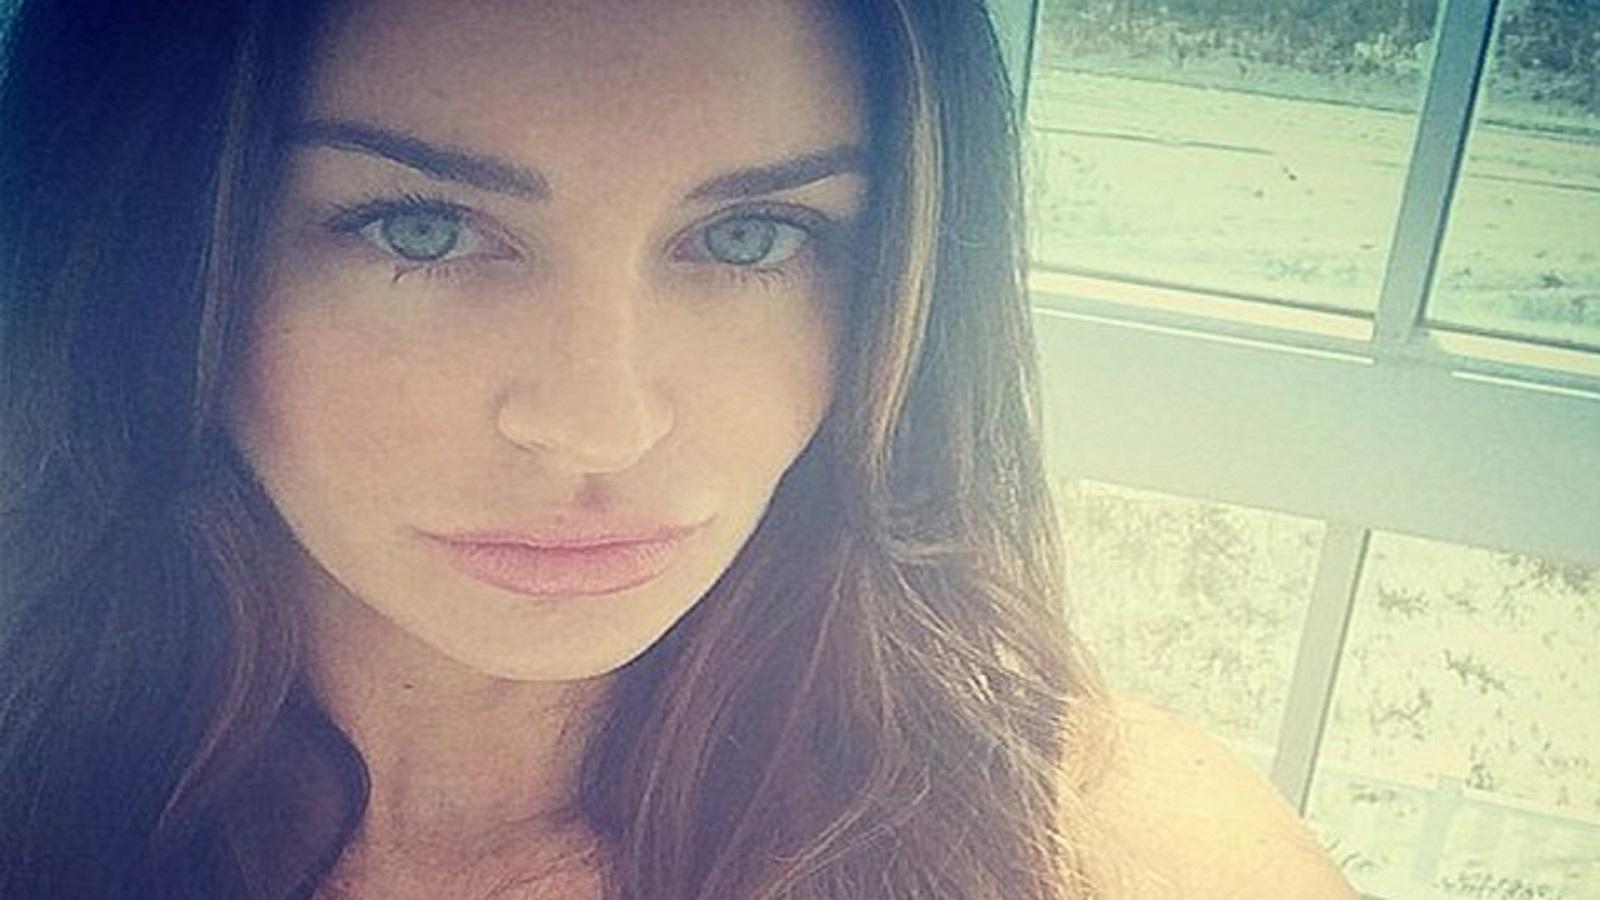 VIDEO: La policía investiga la muerte de la modelo Playboy, Christina Kraft